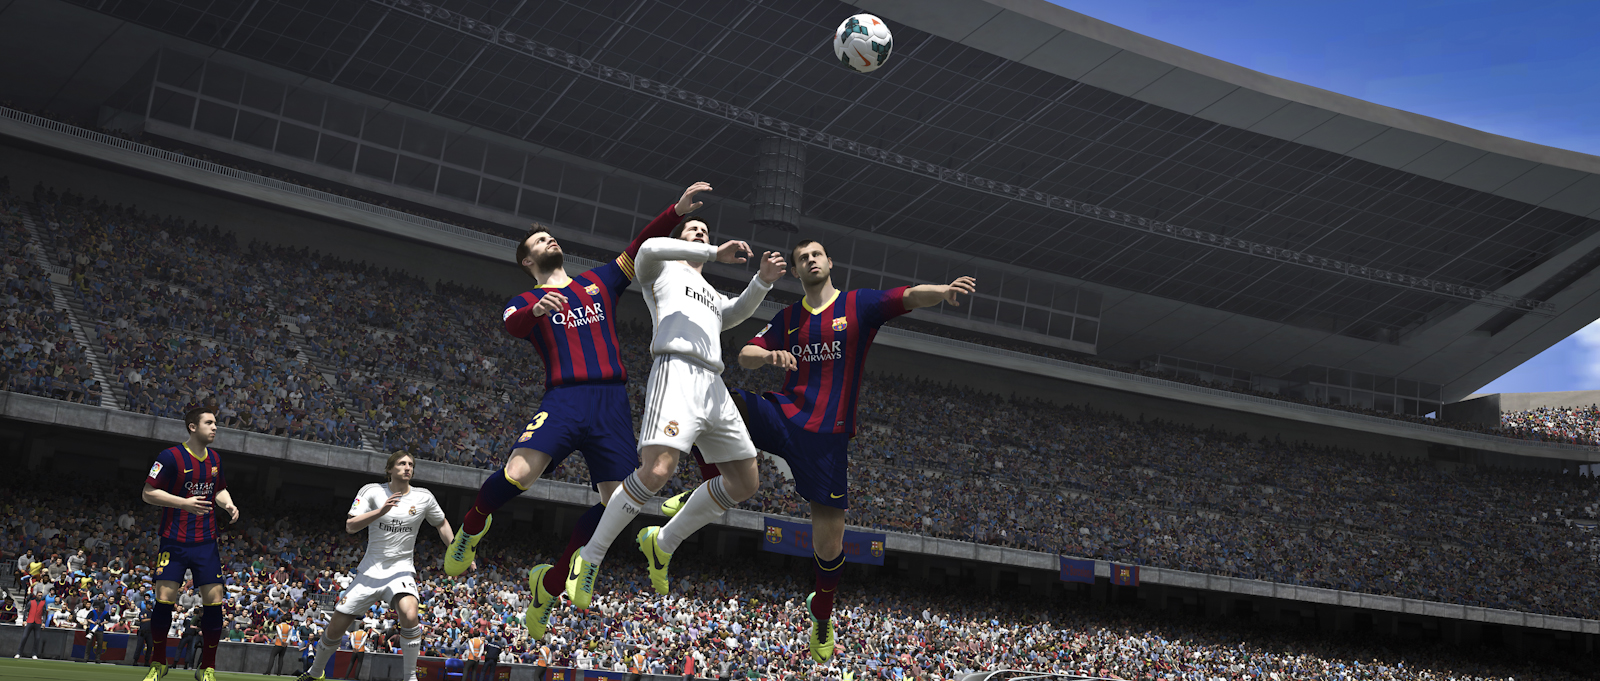 fifa14_xboxone_barcelona_realmadrid_inairplay_hd